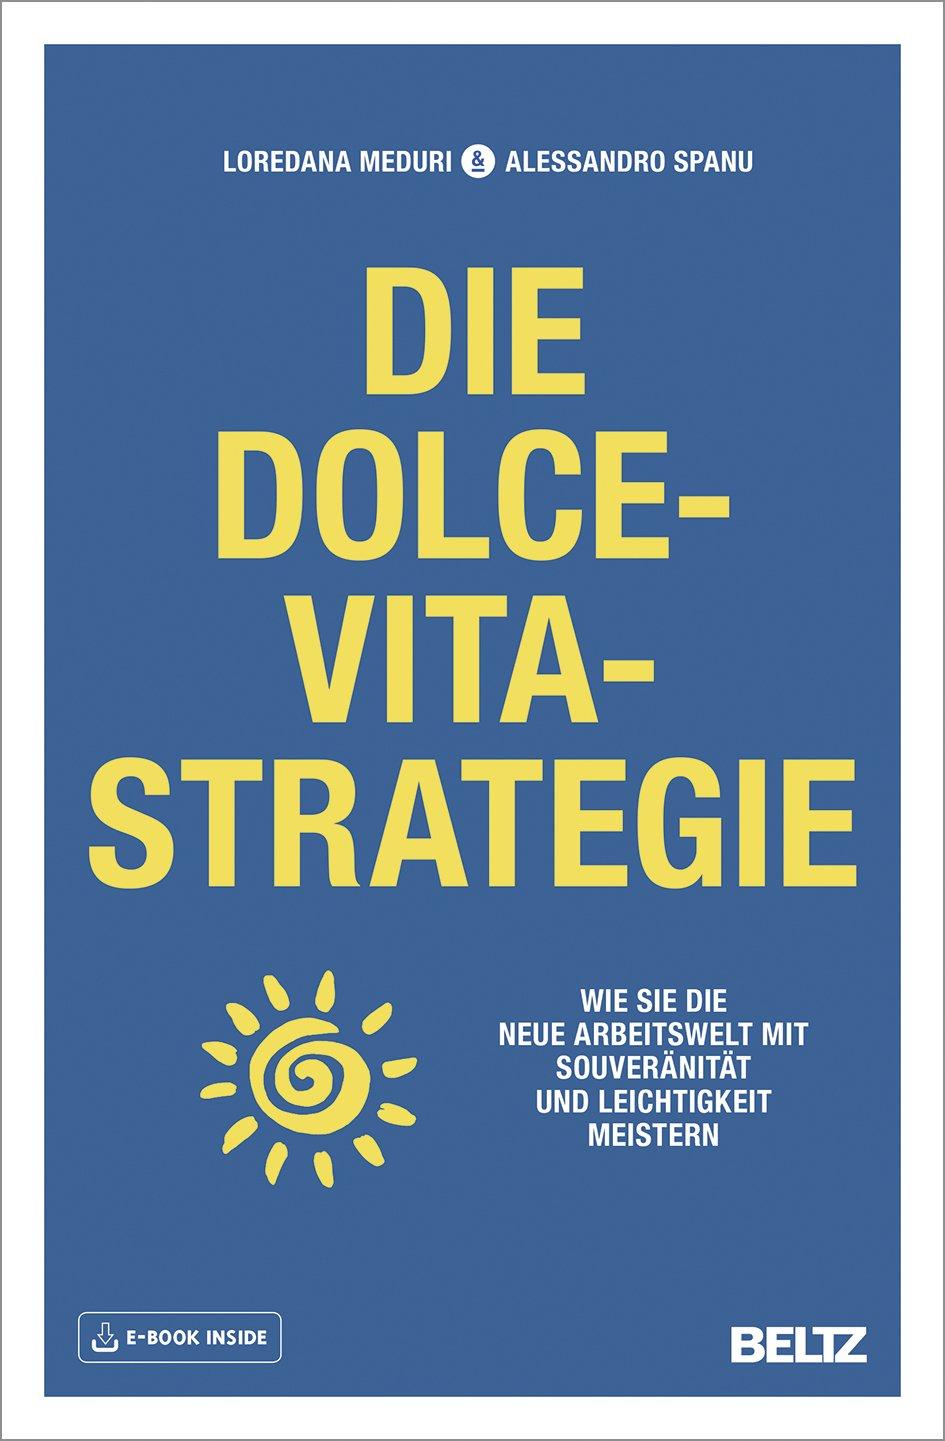 Expert Marketplace -  Loredana Meduri & Alessandro Spanu - Die Dolce-Vita-Strategie